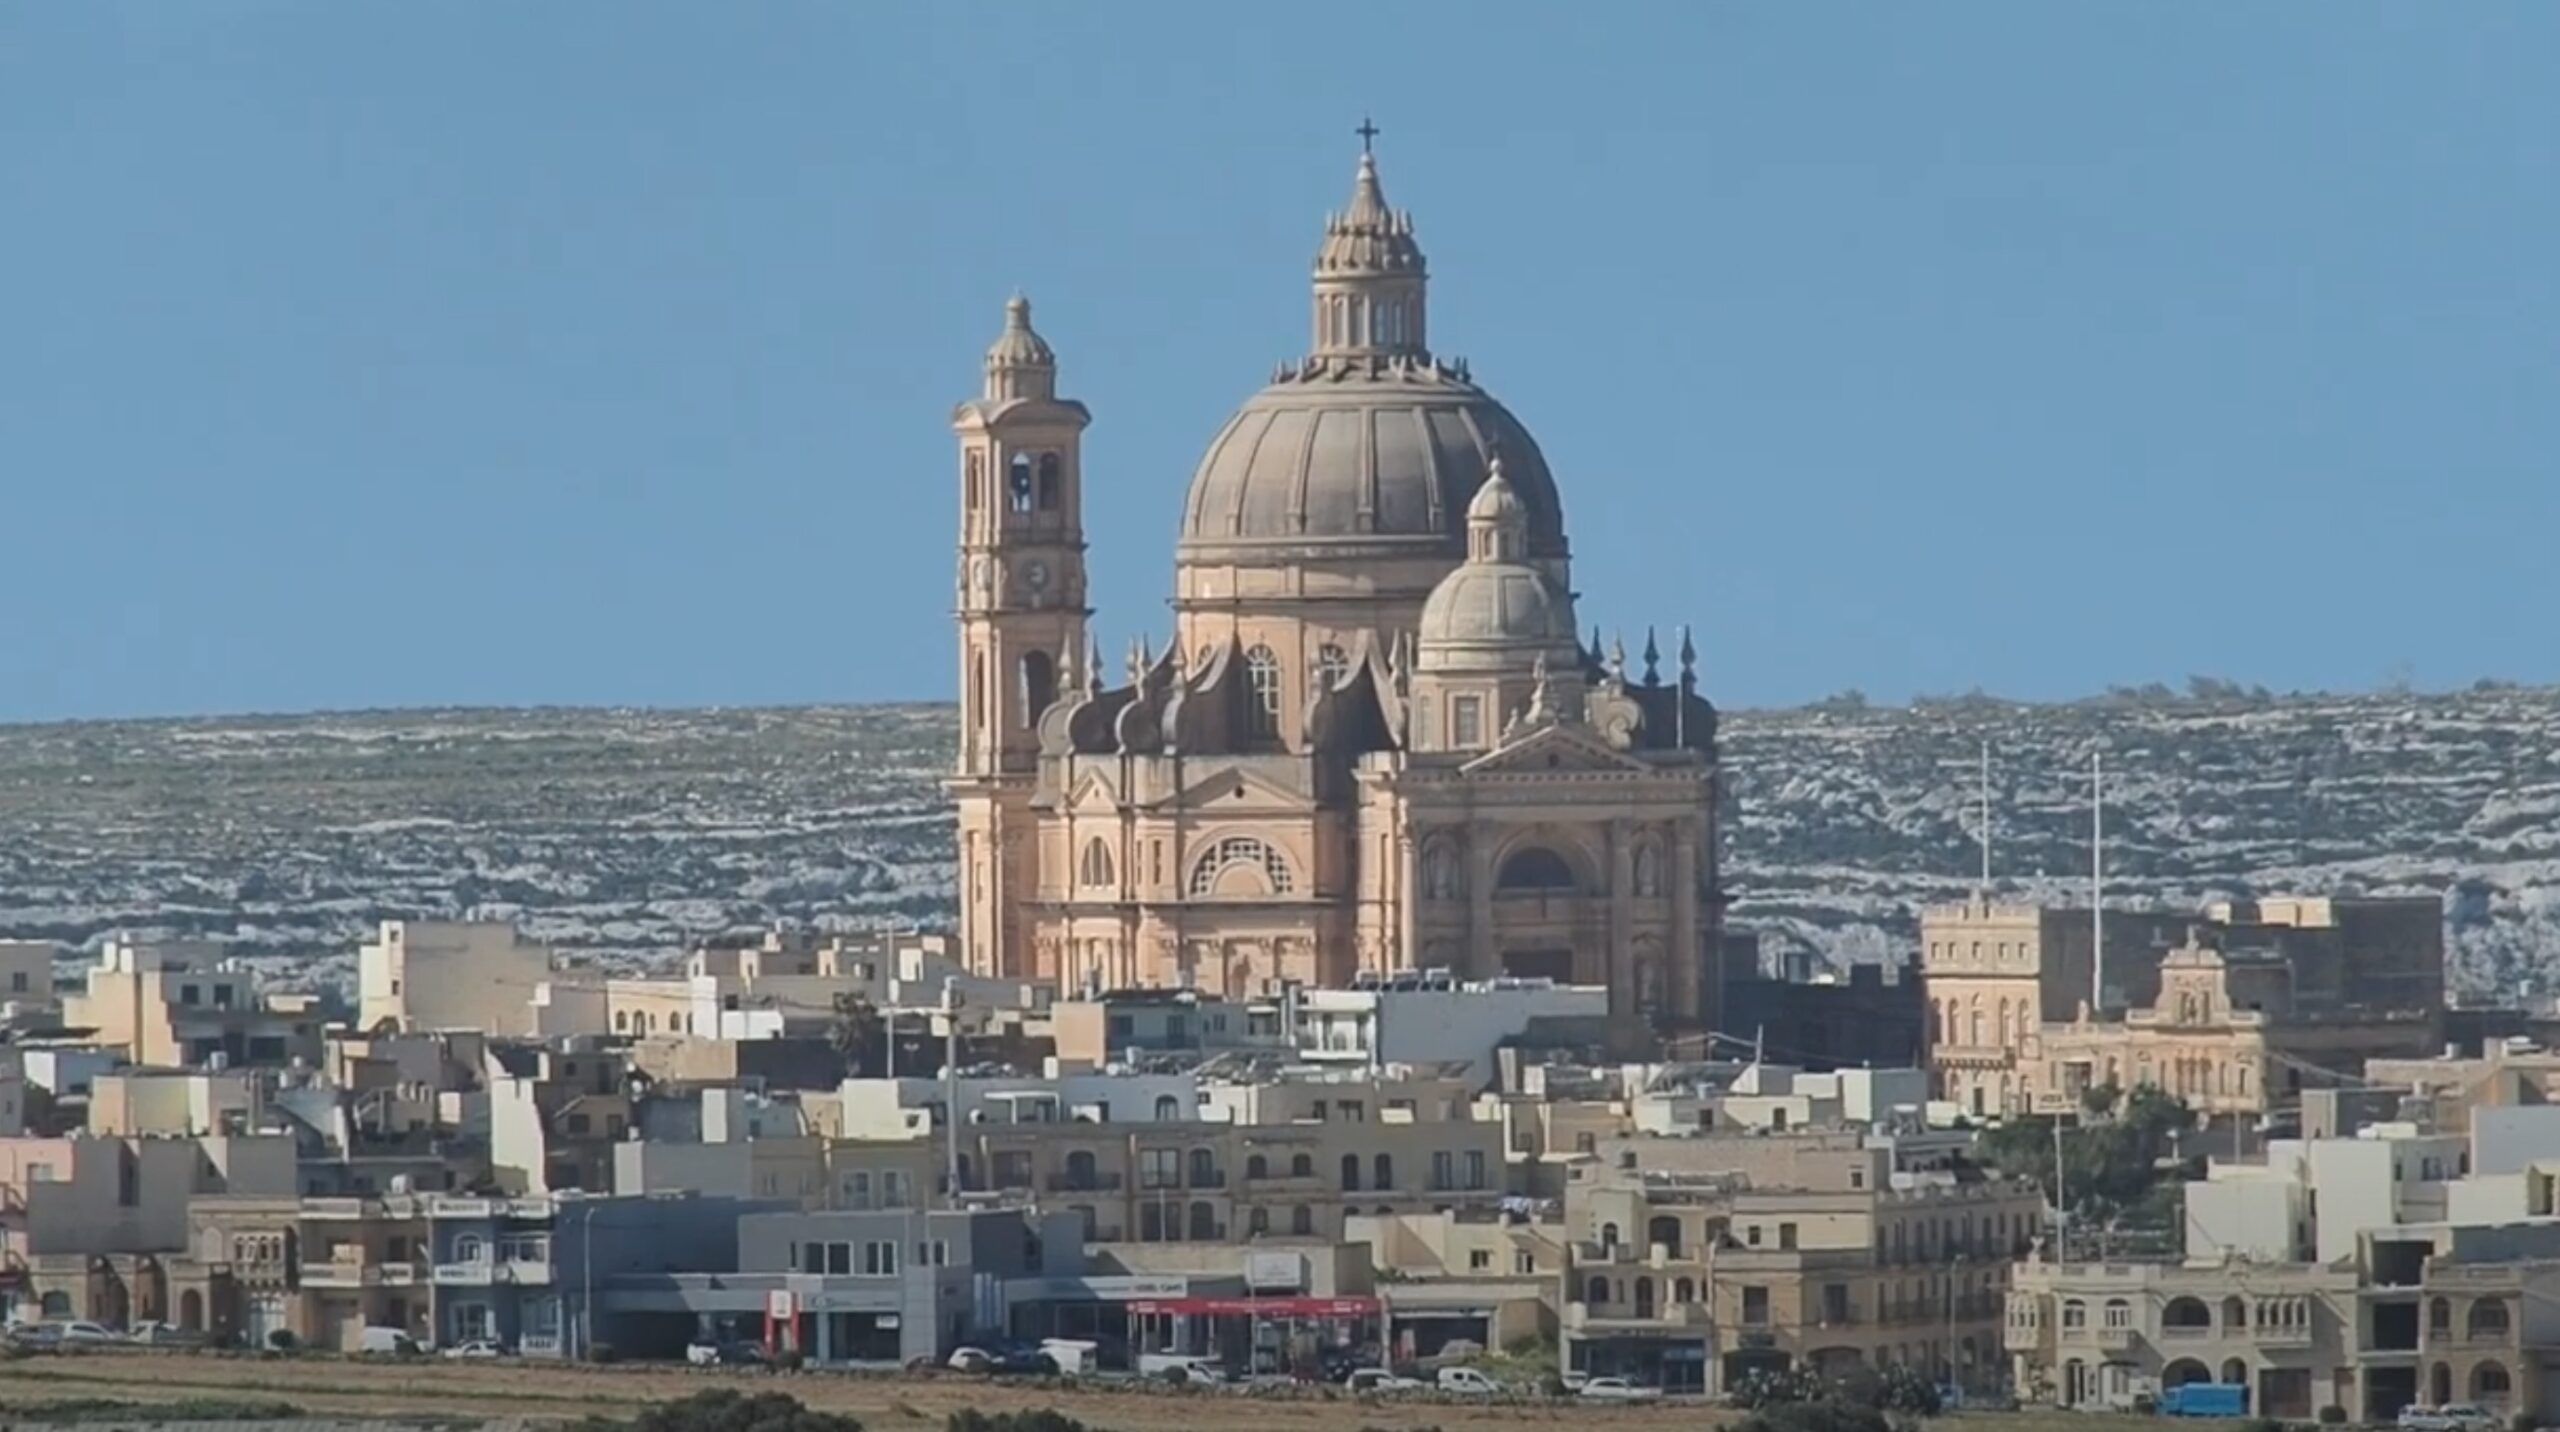 Descubriendo la isla de Gozo en Malta